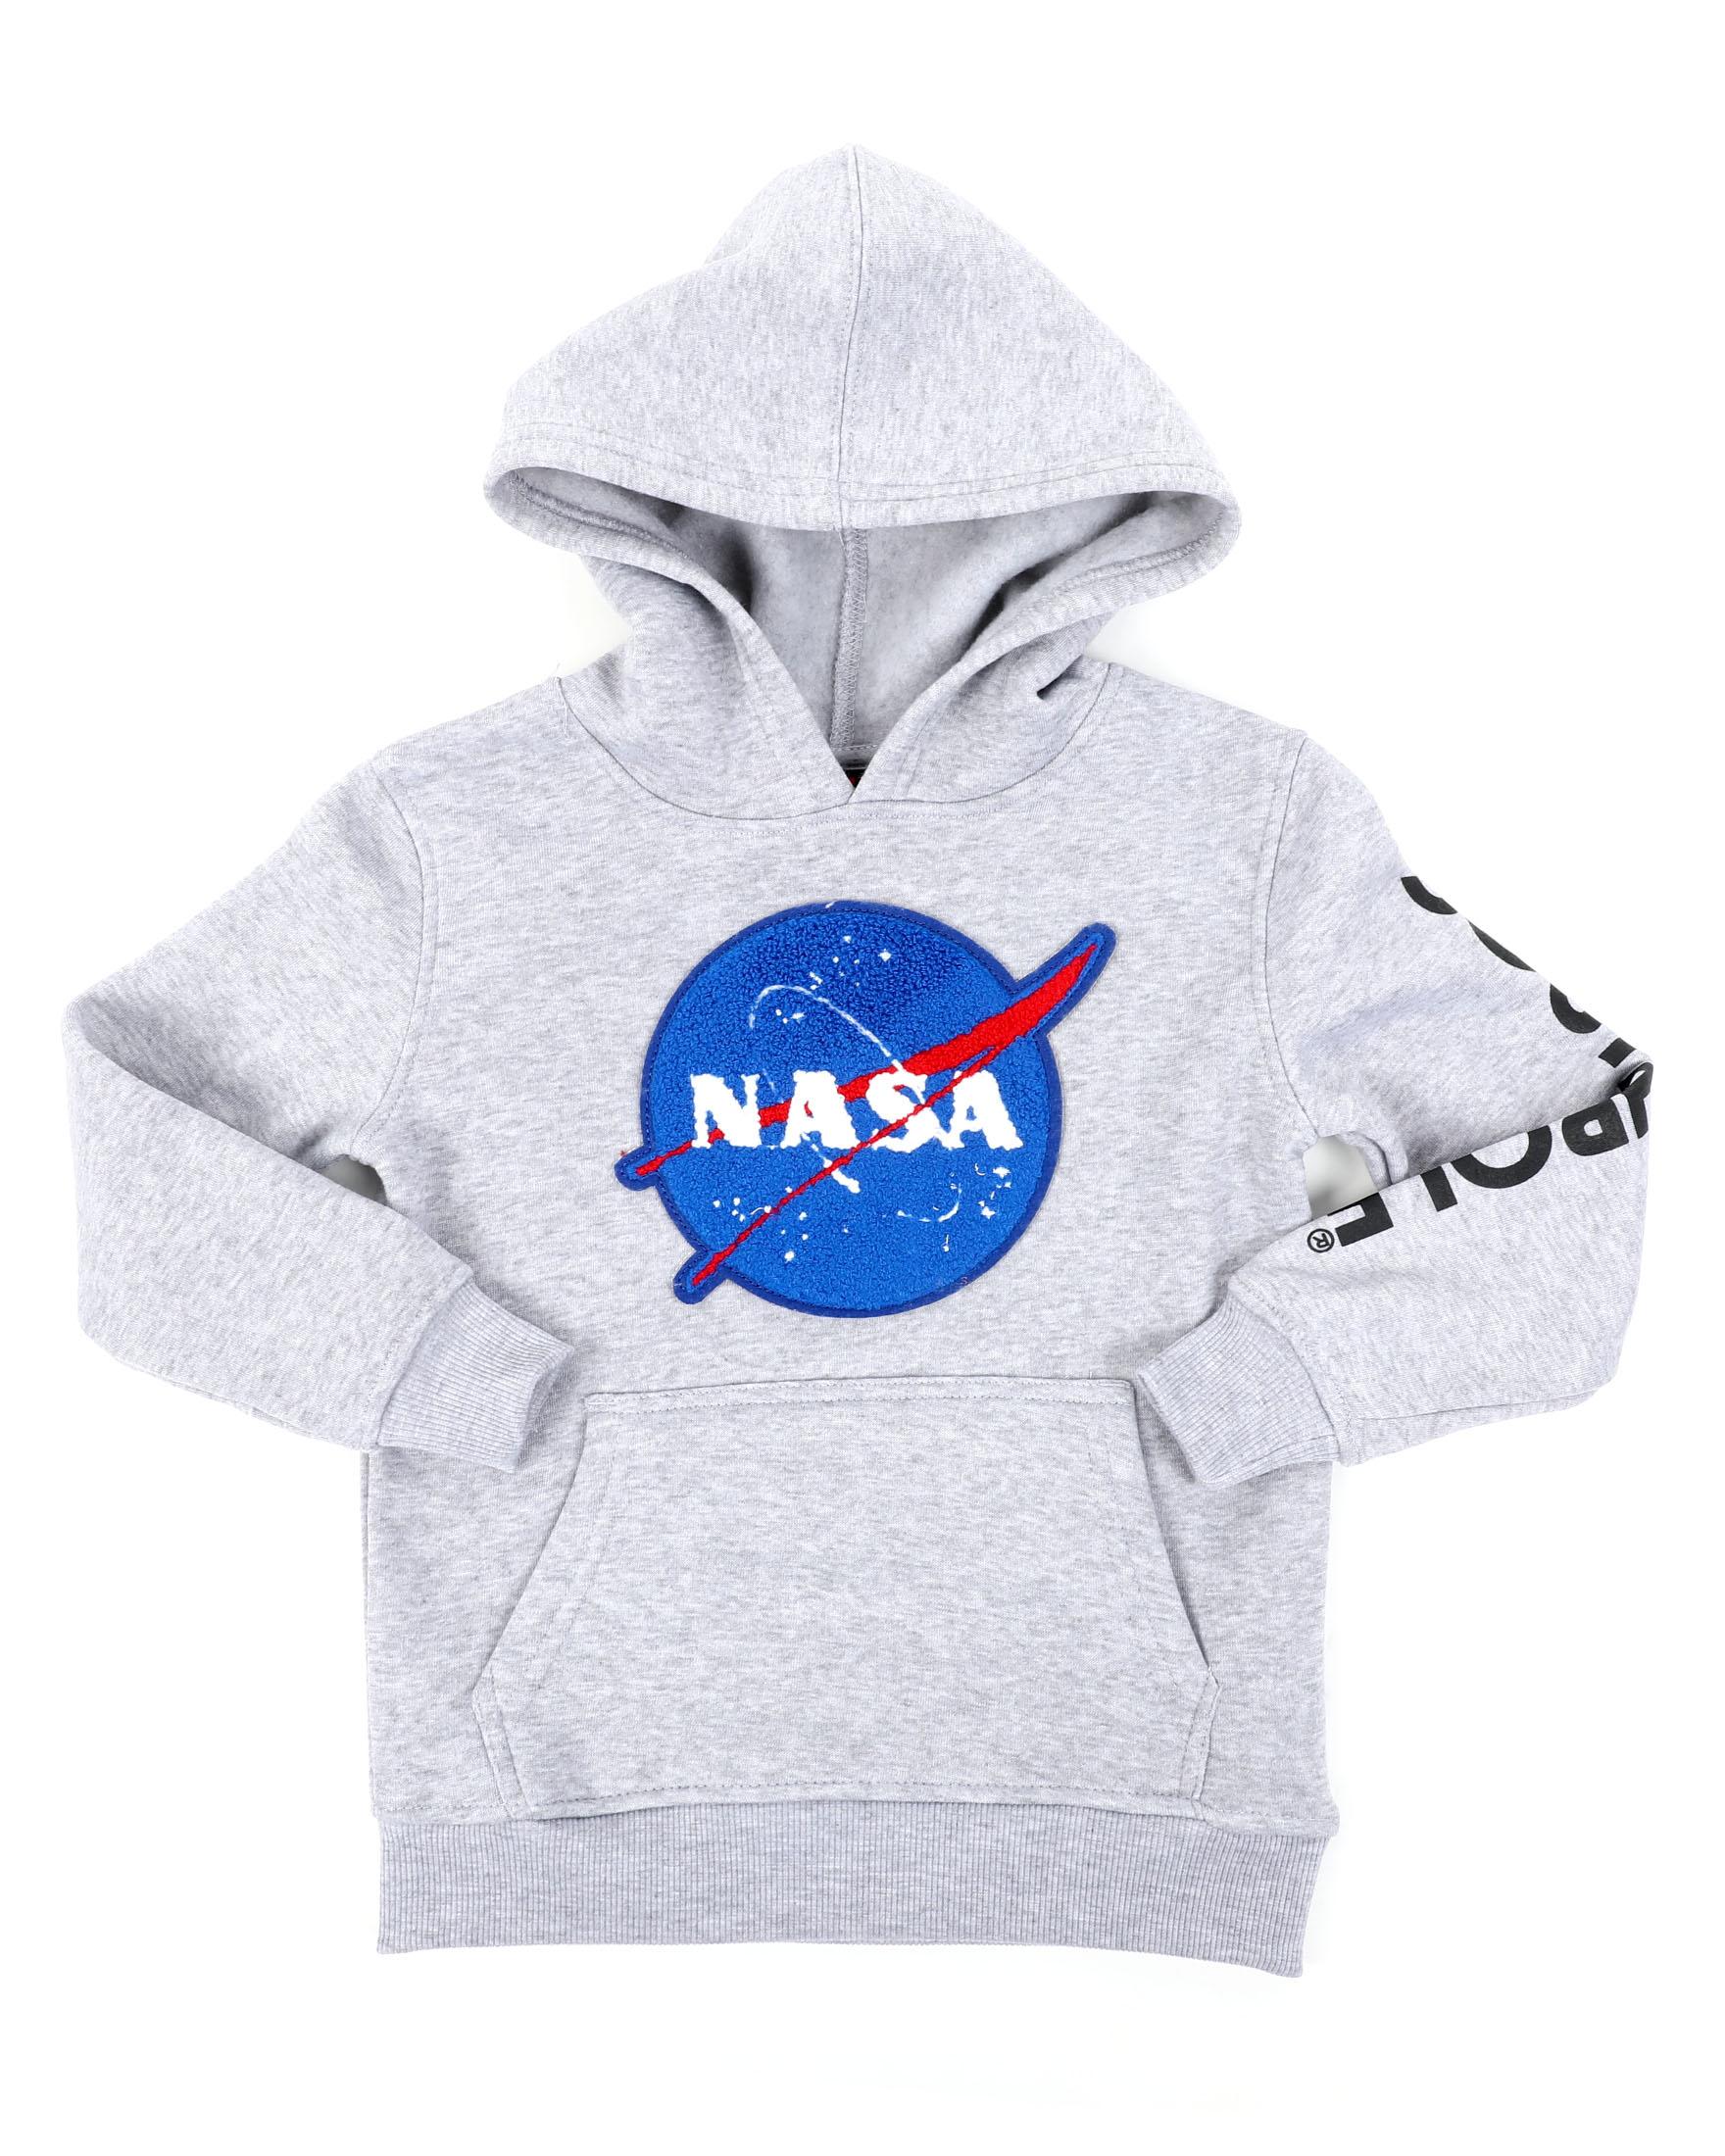 Buy Southpole x NASA Pullover Fleece Hoodie W Chenille